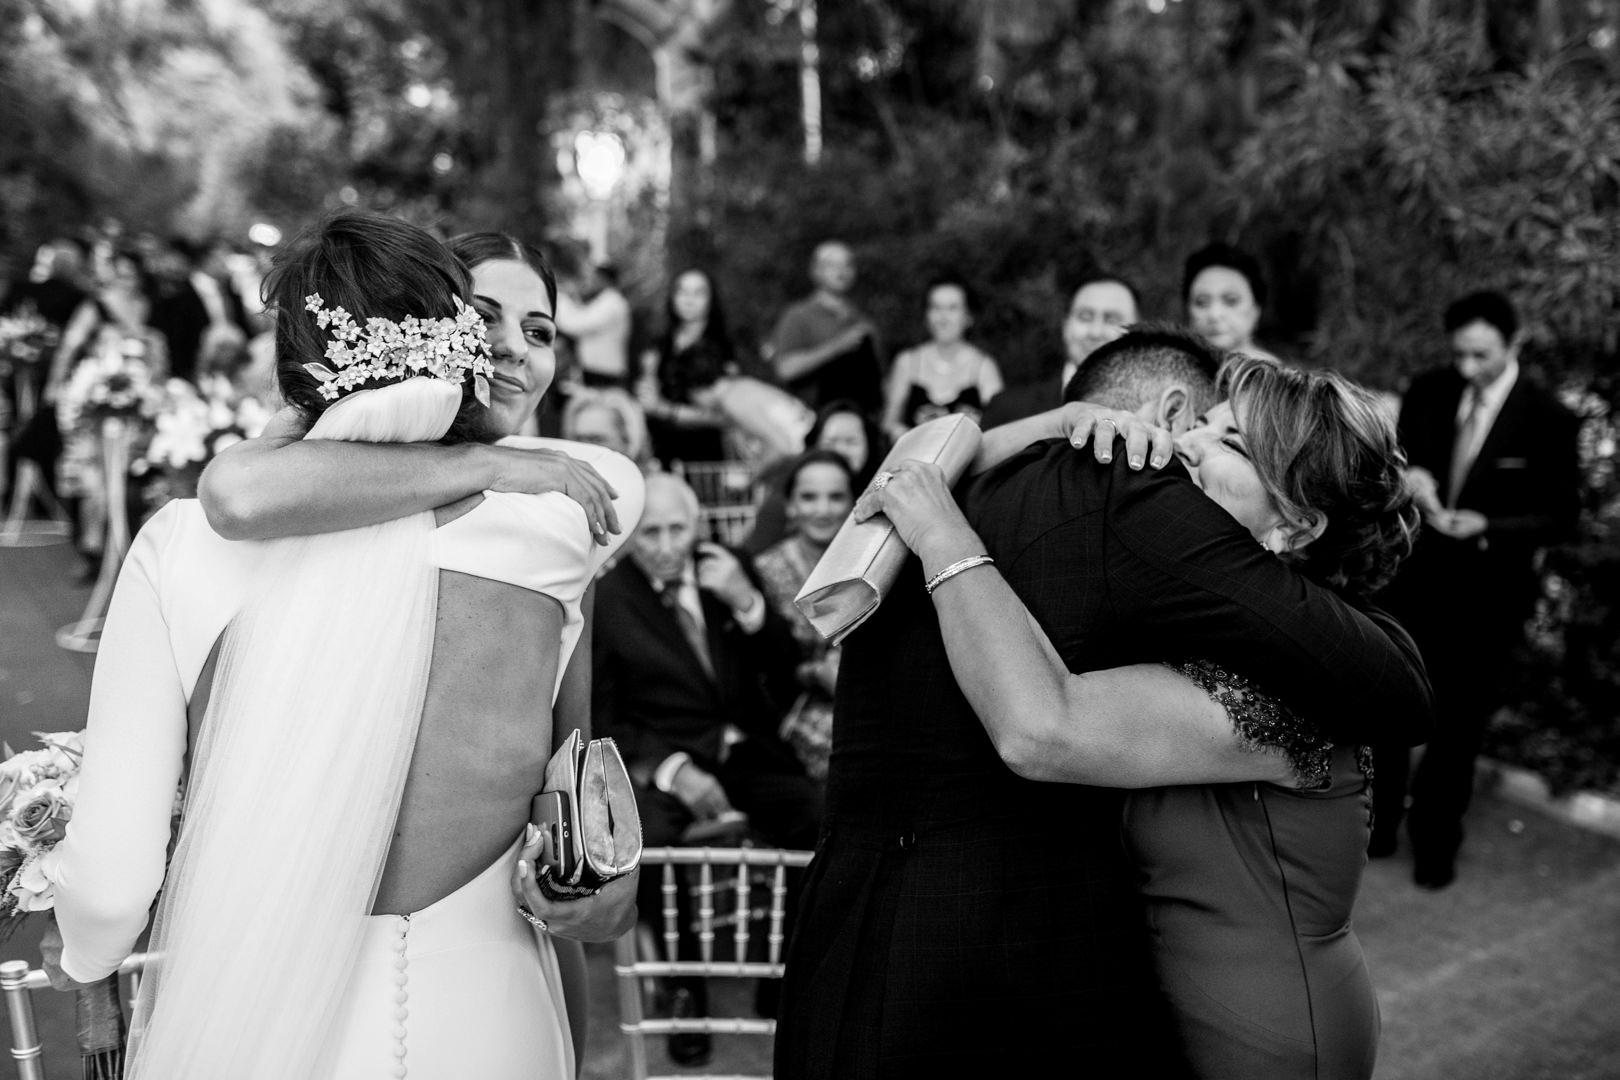 Boda-Irene-Marcos-Dos-Hermanas-Finca-Clotidle-engagement-Rafael-Torres-fotografo-bodas-sevilla-madrid-barcelona-wedding-photographer--27.jpg